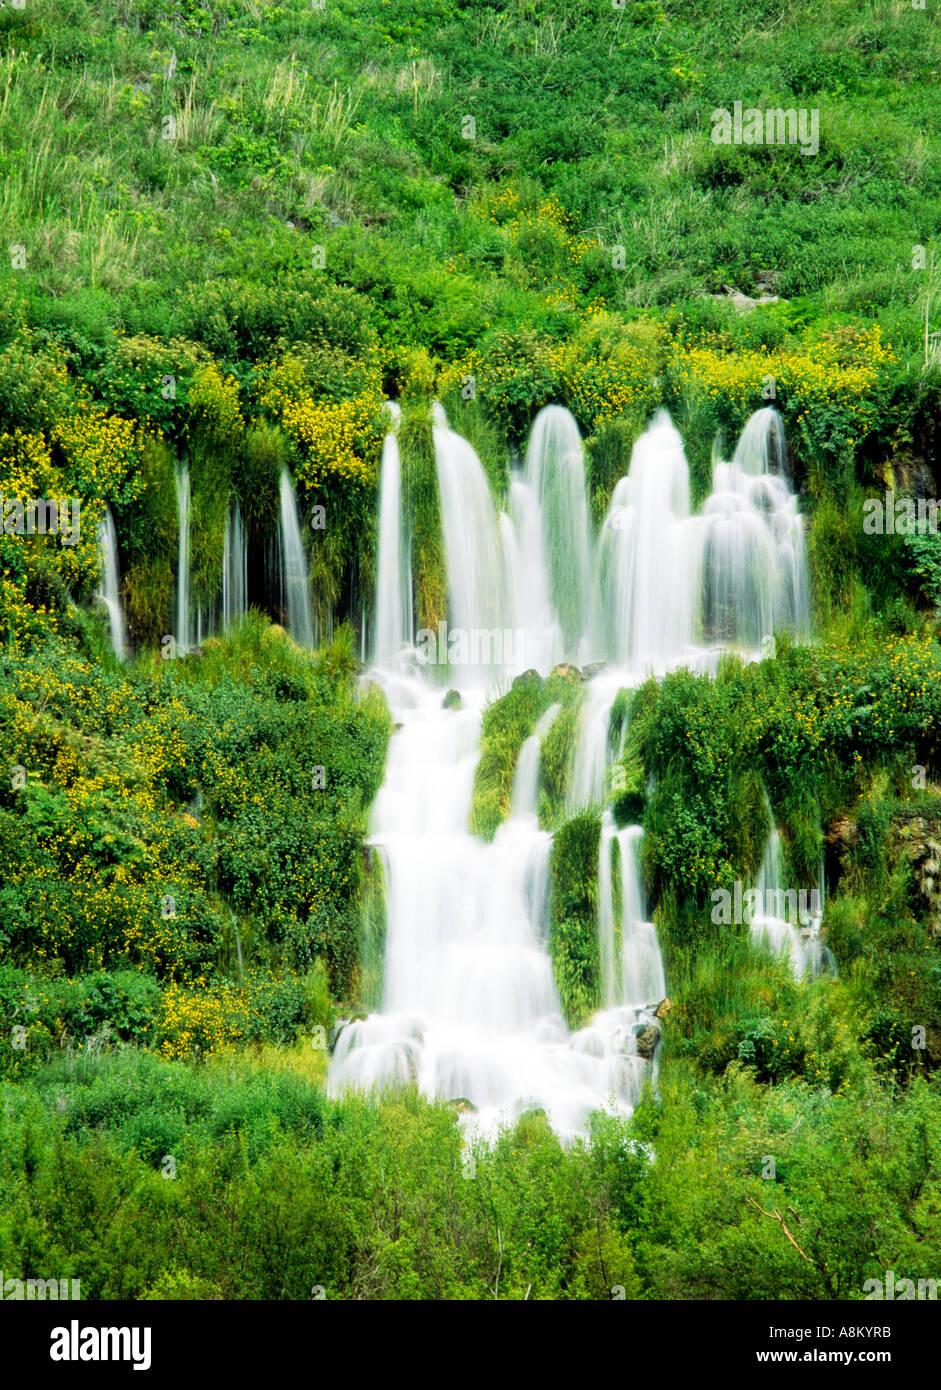 USA IDAHO NIAGARA SPRINGS STATE PARK Thousand springs cascading from waterfalls Hagerman Valley - Stock Image